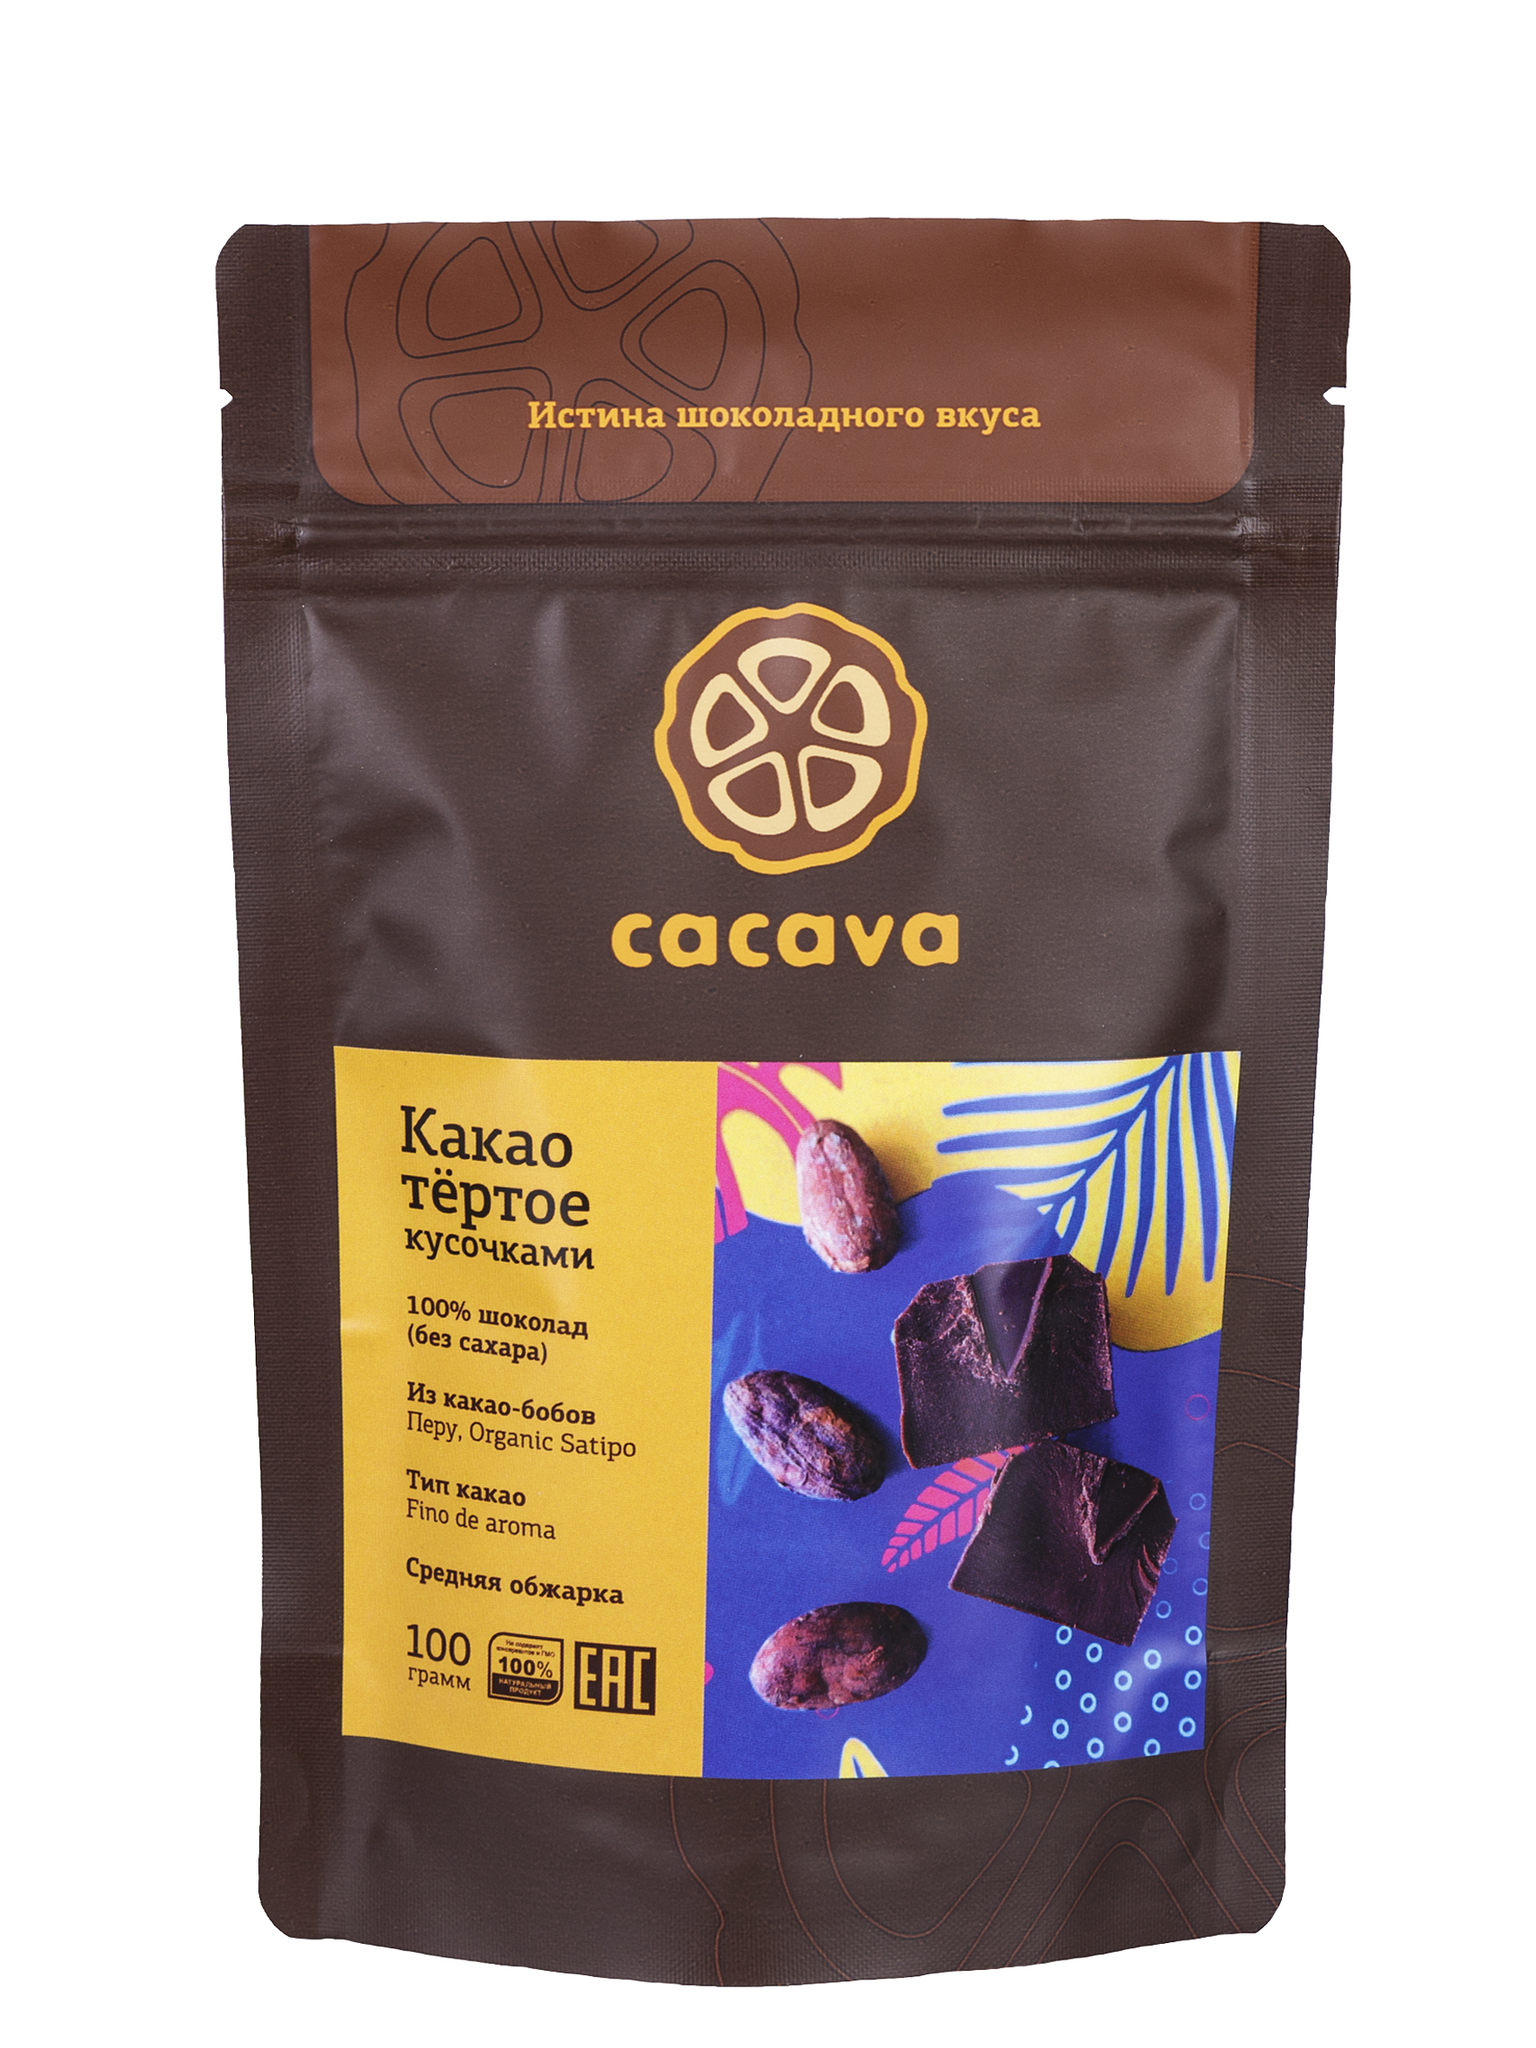 Какао тёртое кусочками (Перу, Organic Satipo), упаковка 100 грамм